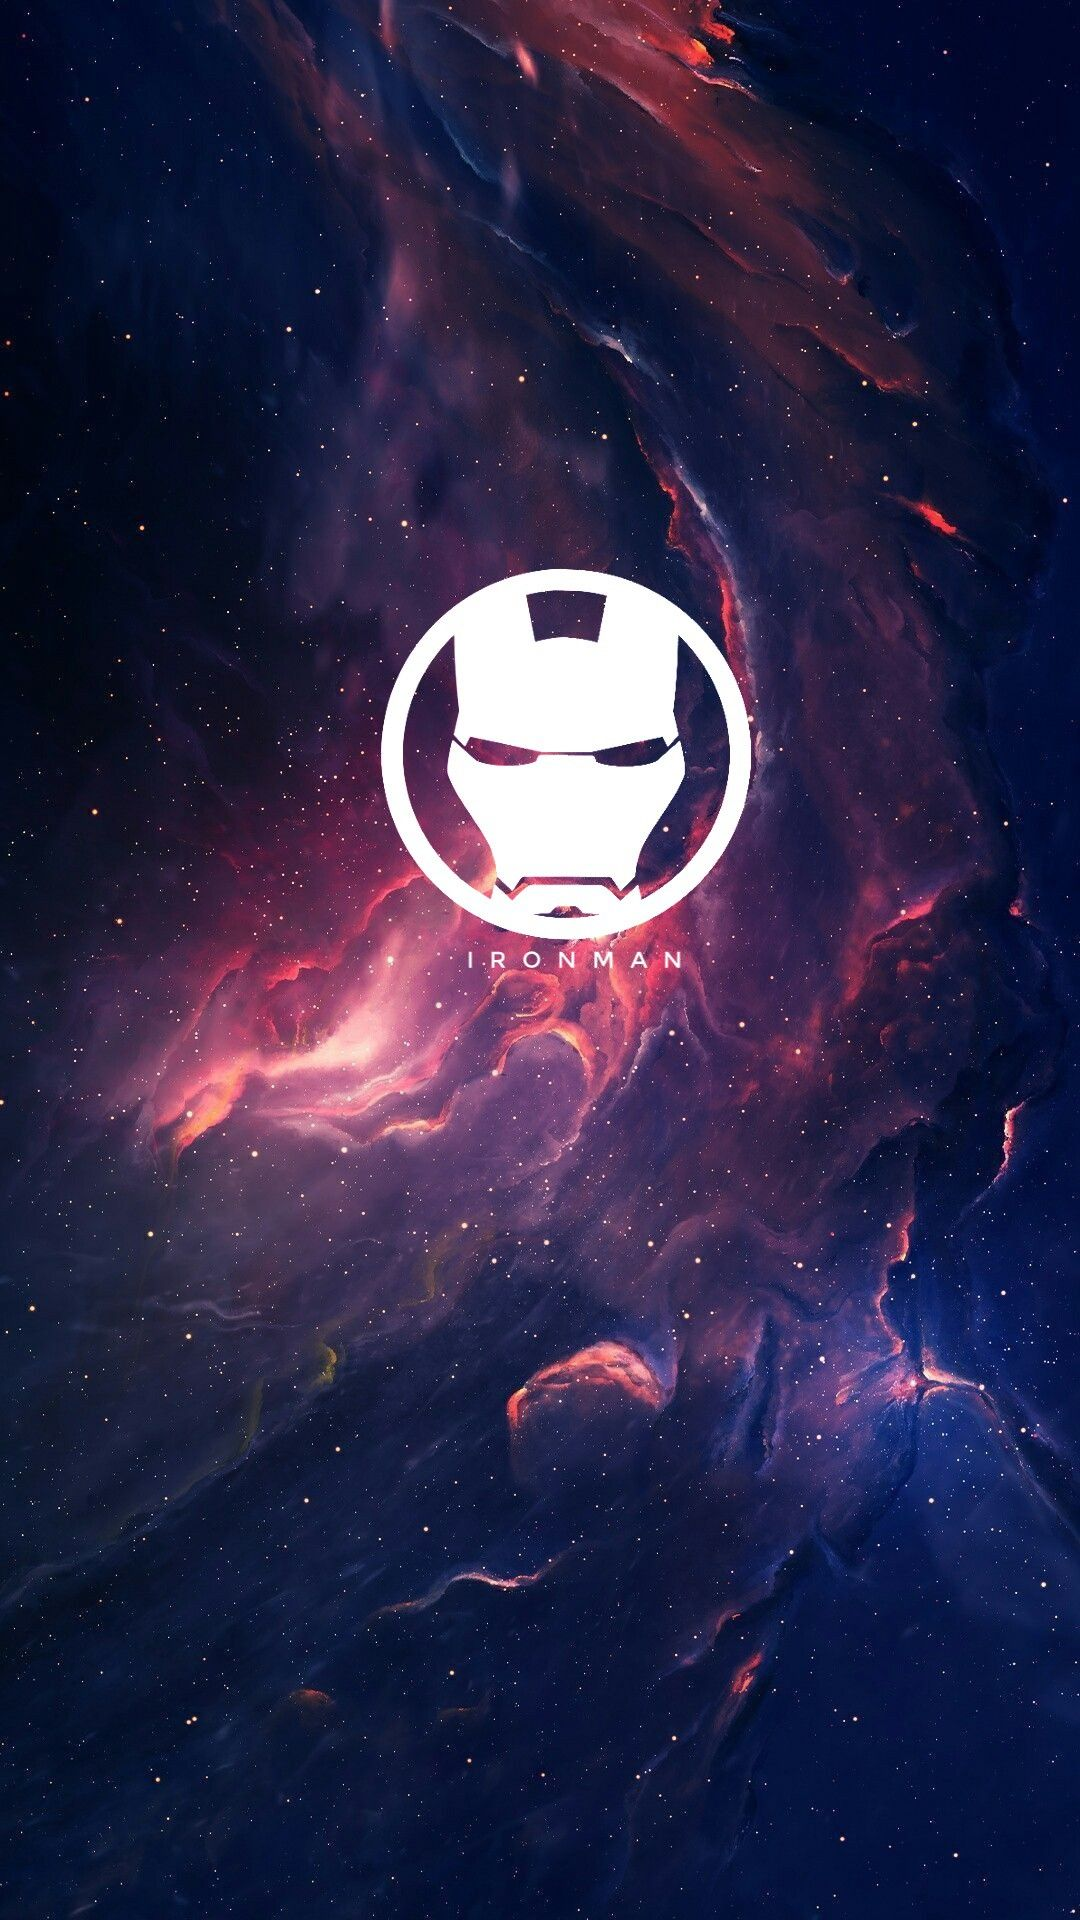 Endgame Iron Man Iron Man Wallpaper Nike Logo Logos Zima Blue